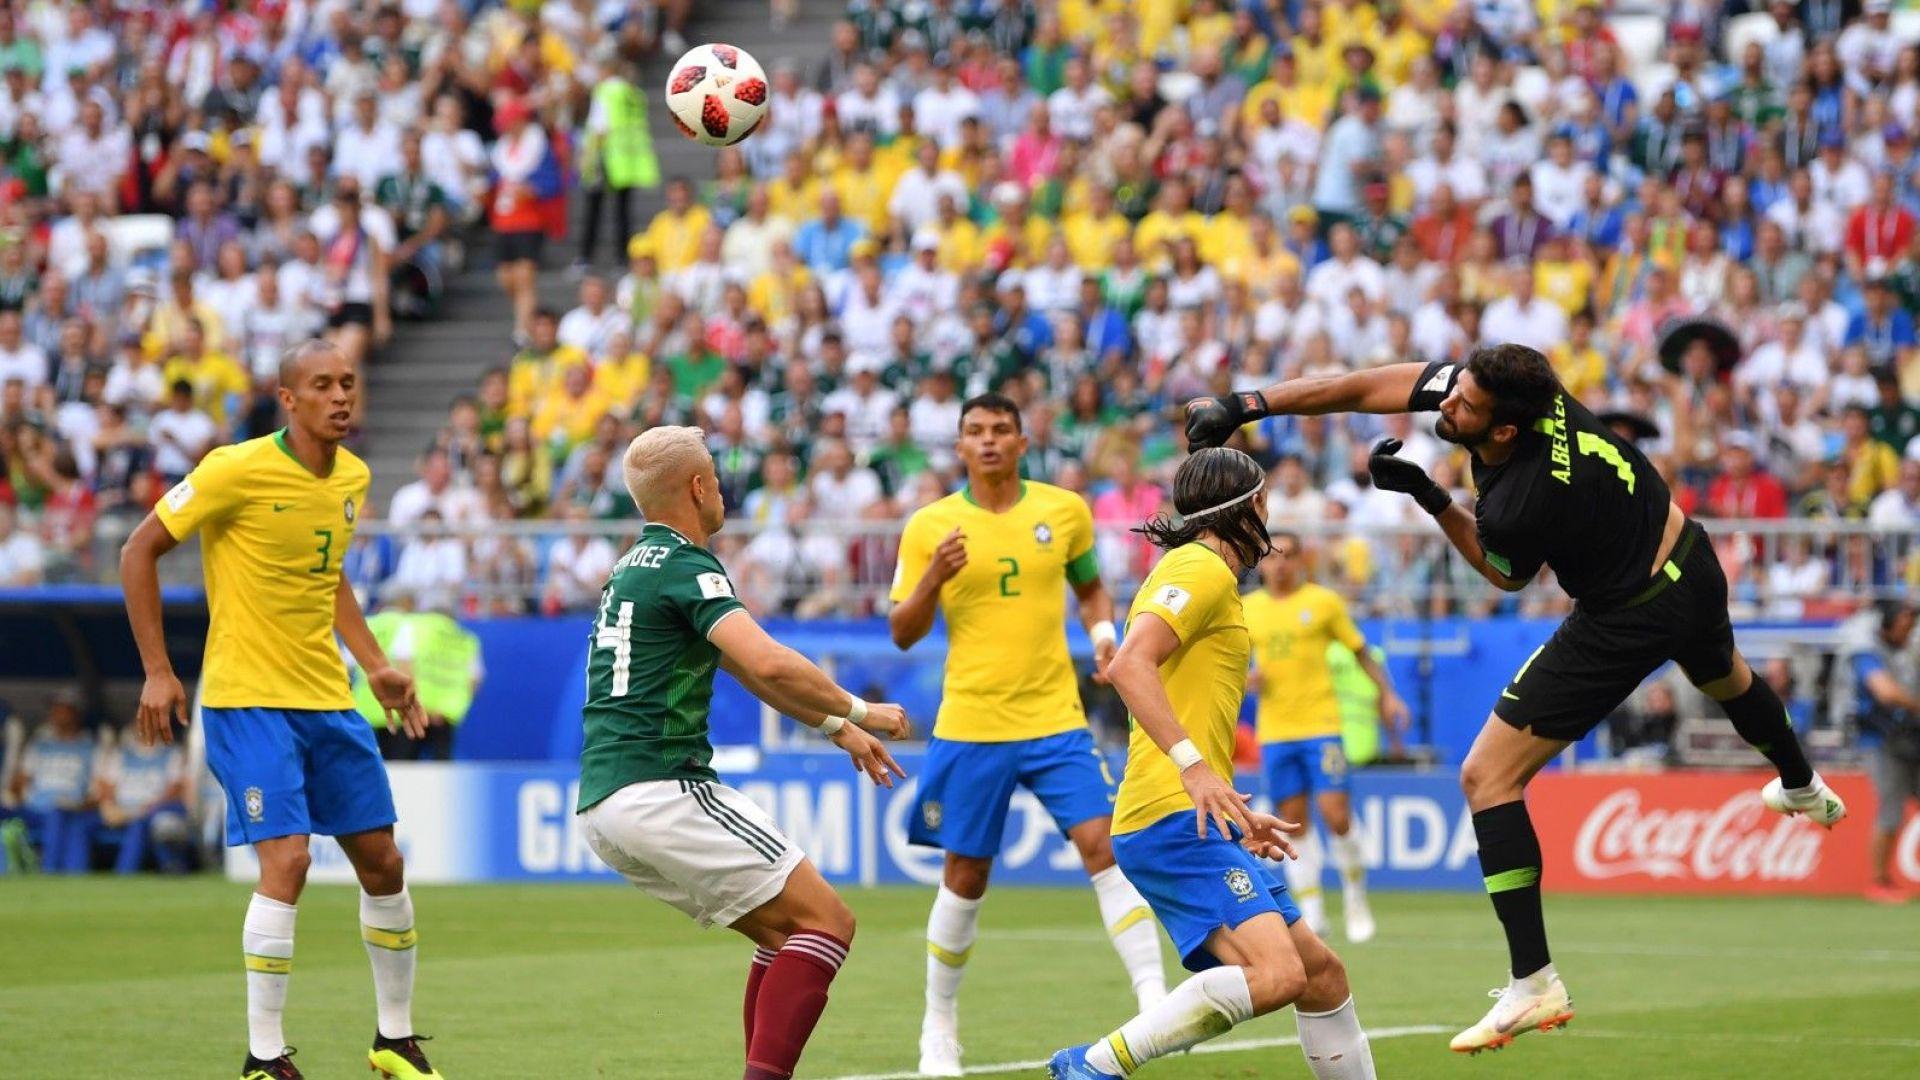 Бразилия - Мексико 2:0 (статистика)